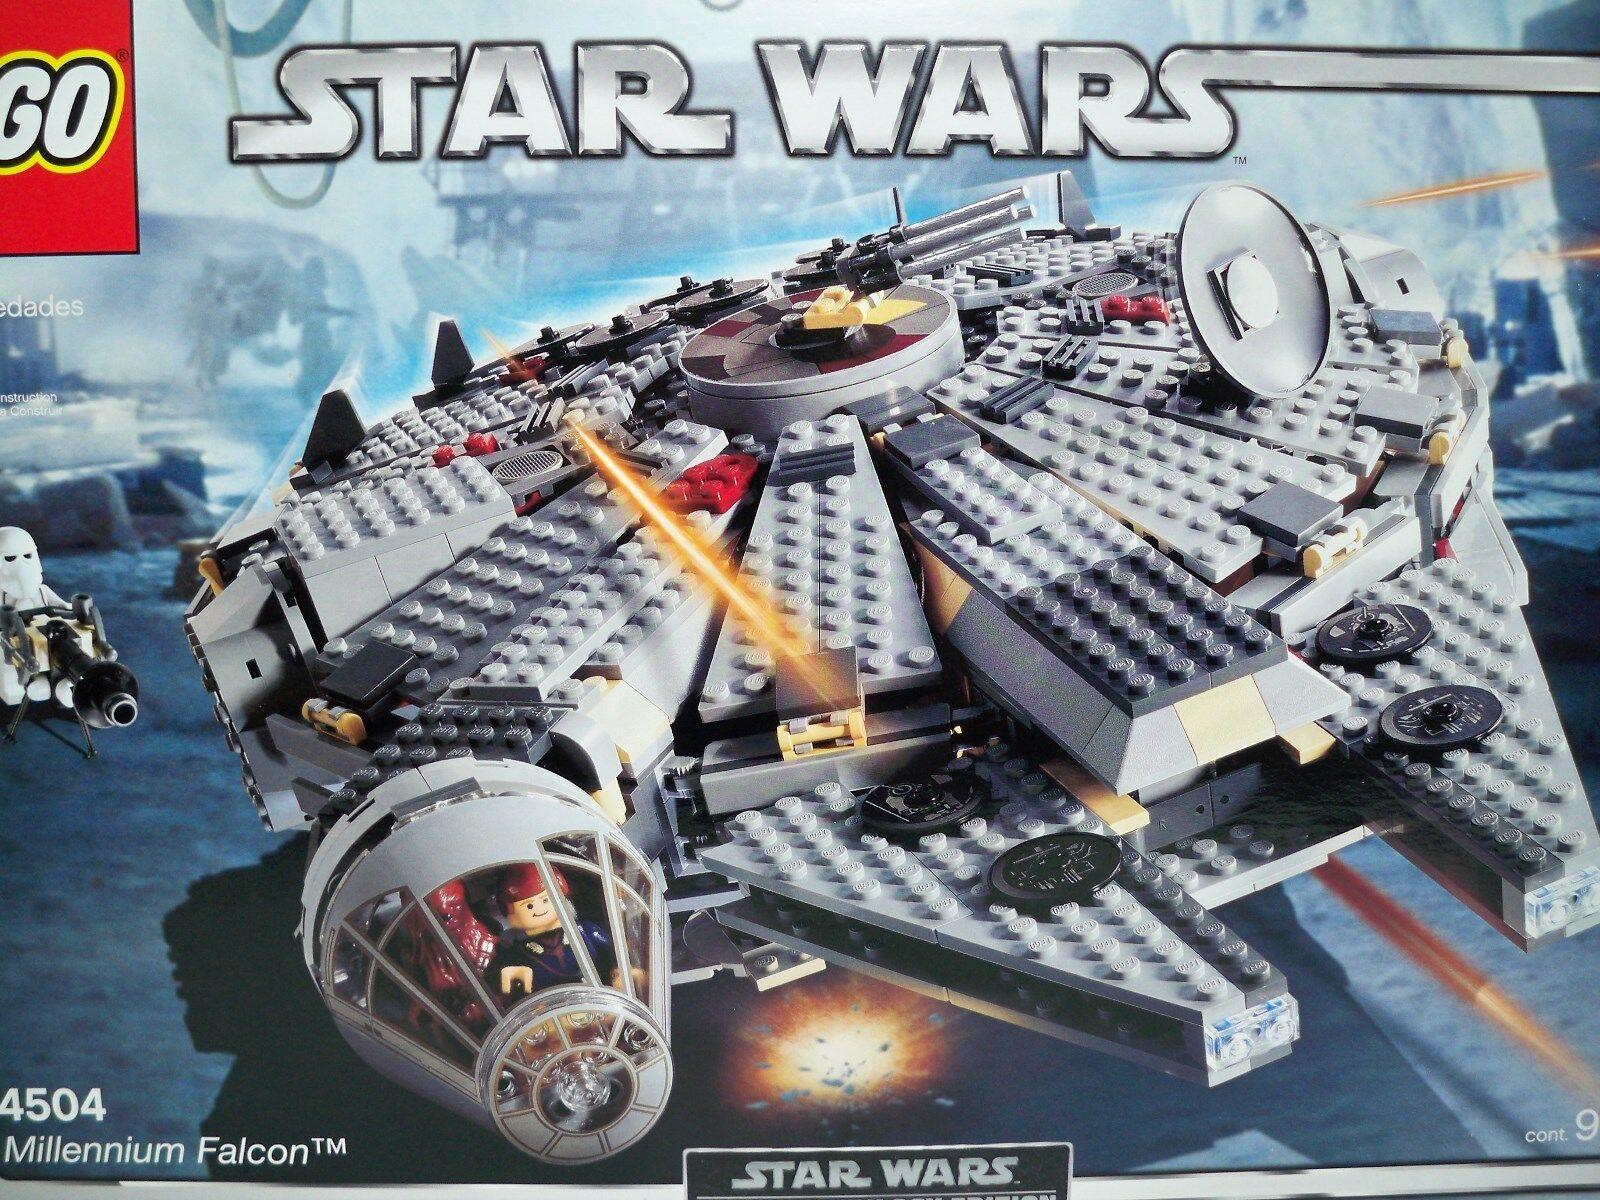 D0559692 MILLENNIUM FALCON LEGO MINT IN SEALED BOX MISB ORIGINAL STAR WARS